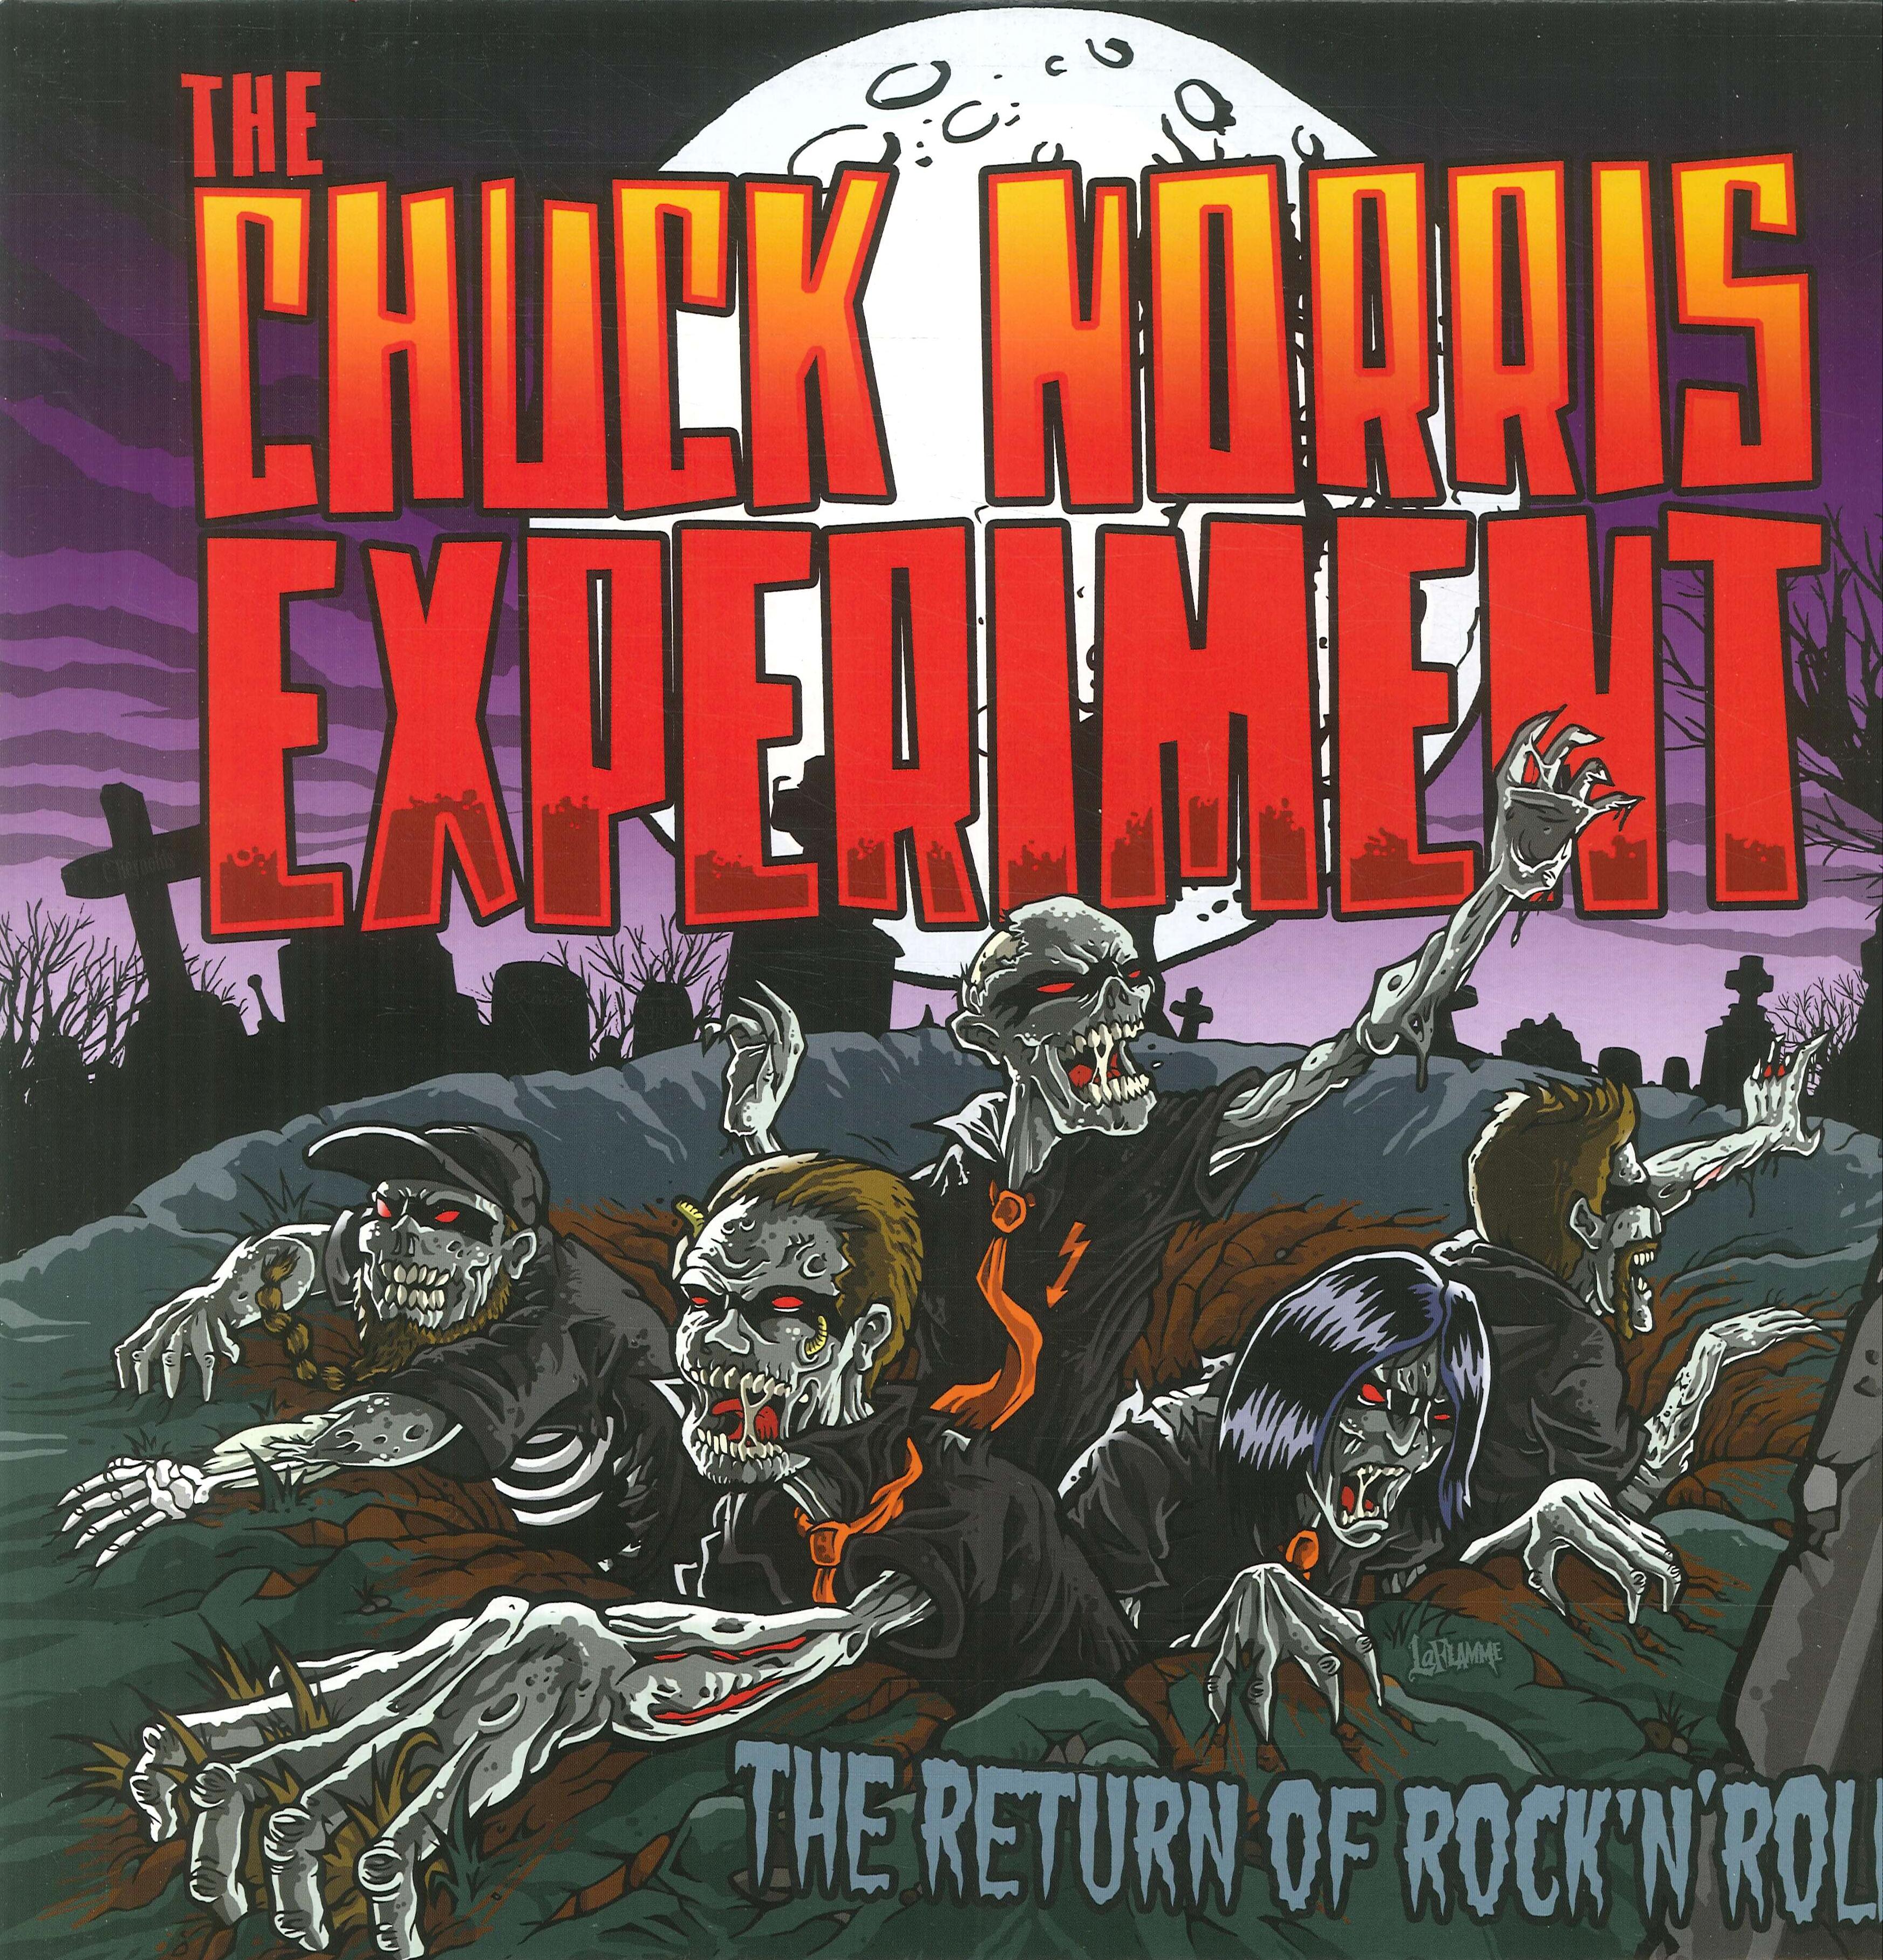 Chuck Norris Experiment. The Return of Rock'n'roll. [Vinile]